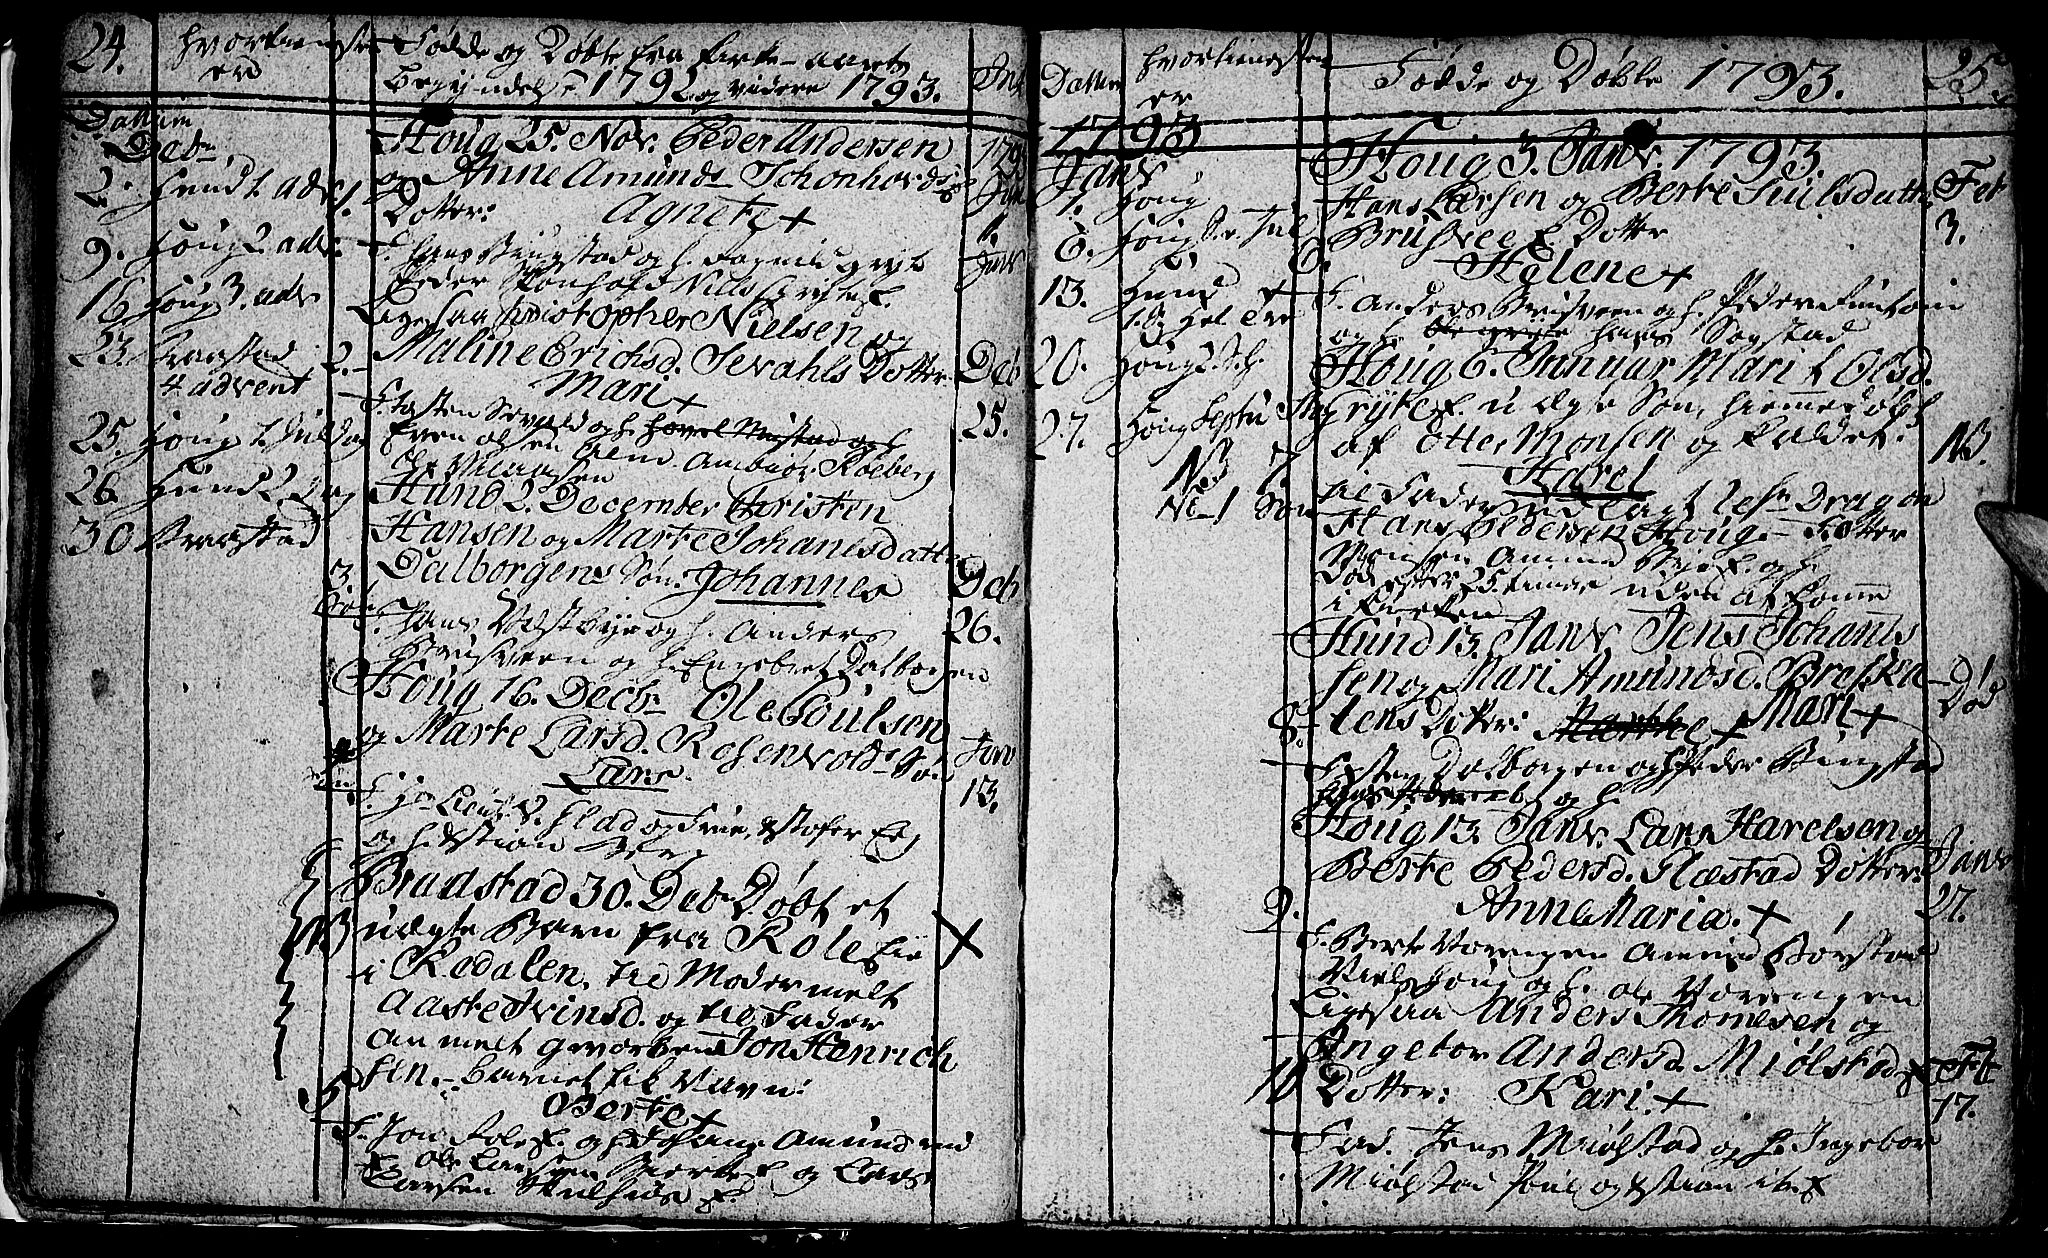 SAH, Vardal prestekontor, H/Ha/Hab/L0002: Klokkerbok nr. 2, 1790-1803, s. 24-25